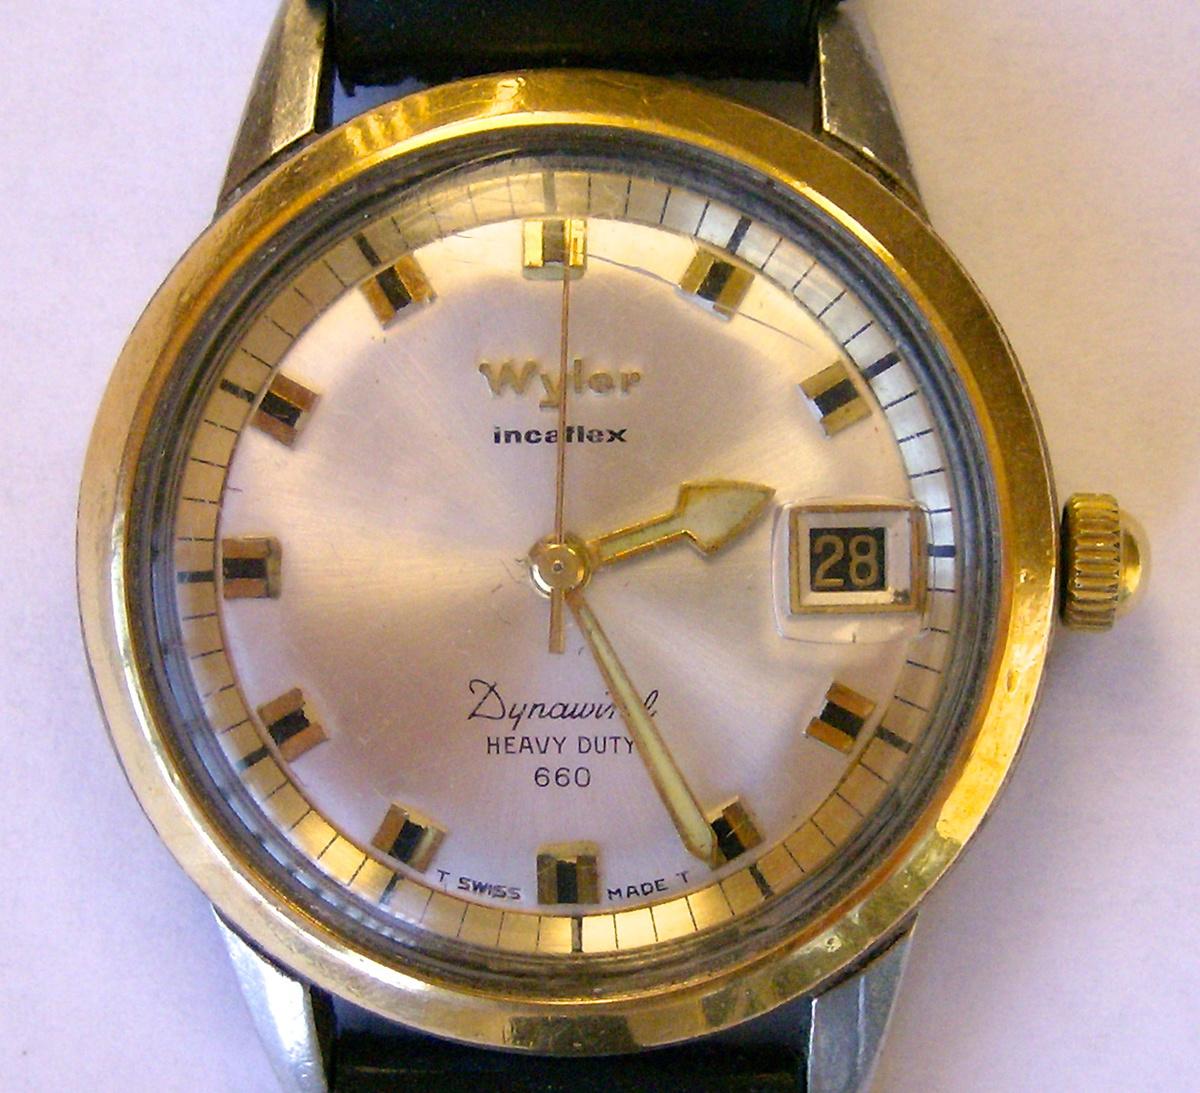 Wyler replica watches - Szz11uyluybdtn2o0aoeca Jpg